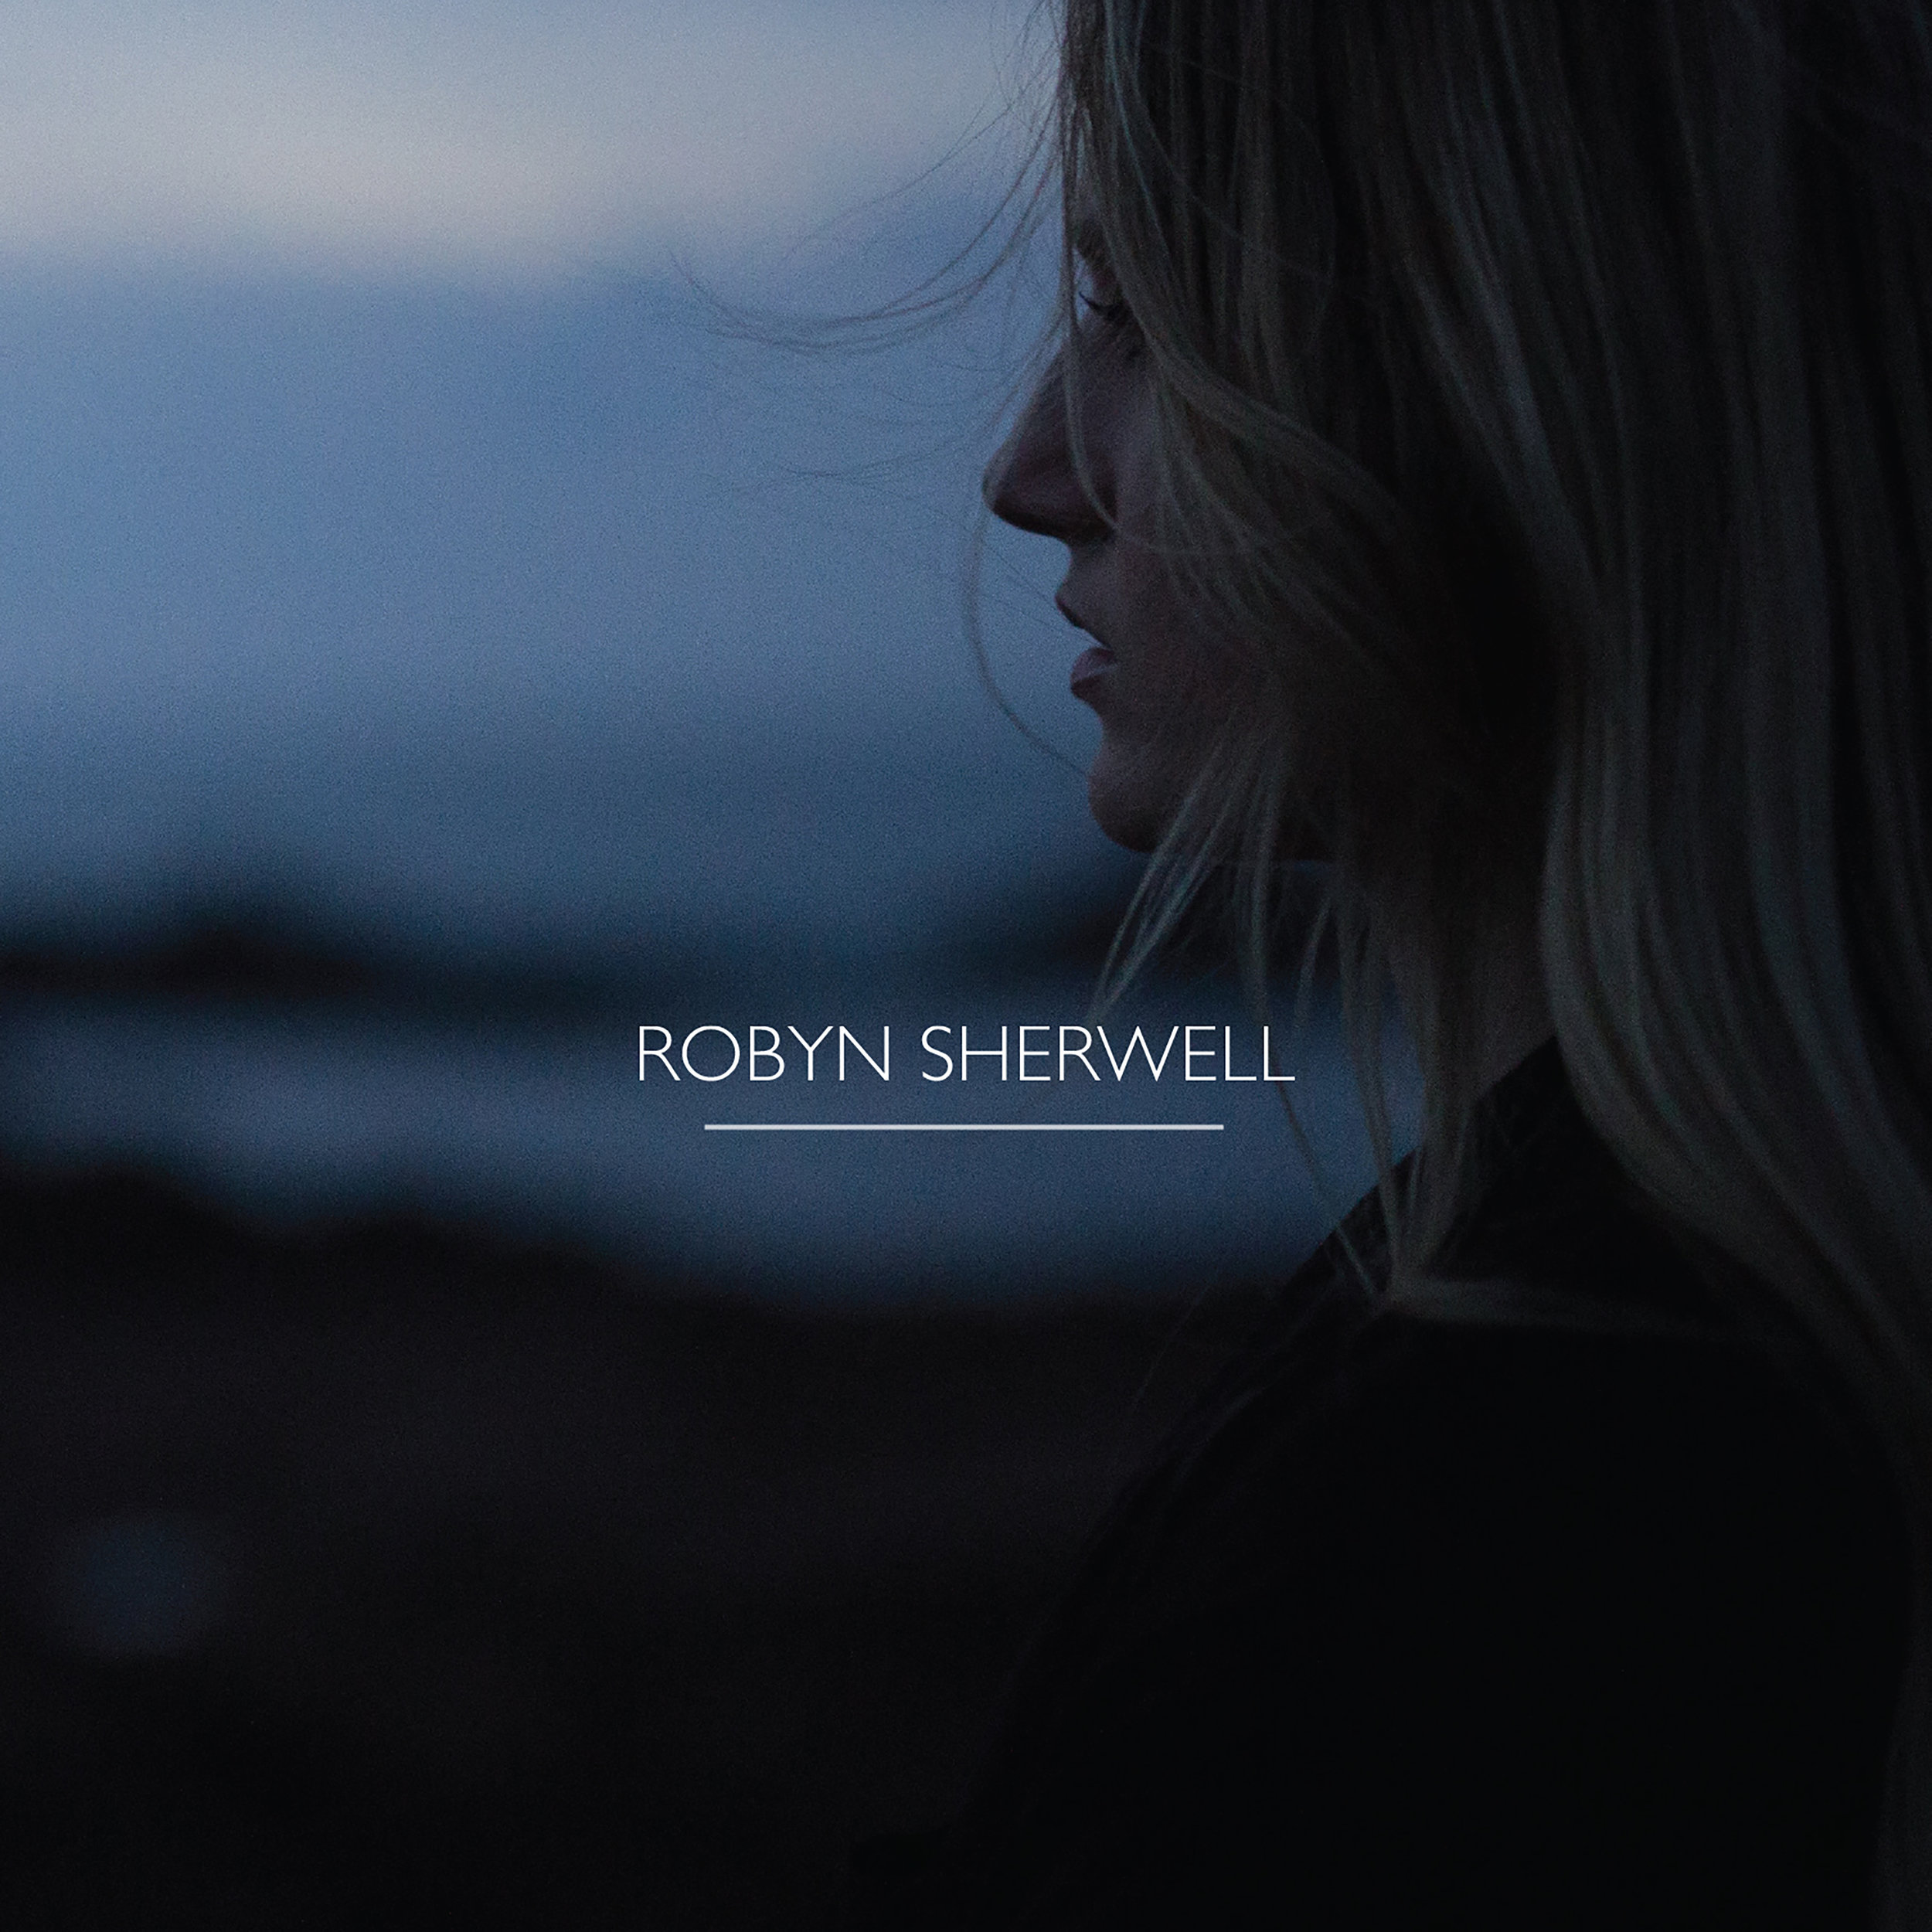 robyn sherwell  PRODUCED BY DAVID KOSTEN  LANDSLIDE PRODUCED BY ROBYN SHERWELL